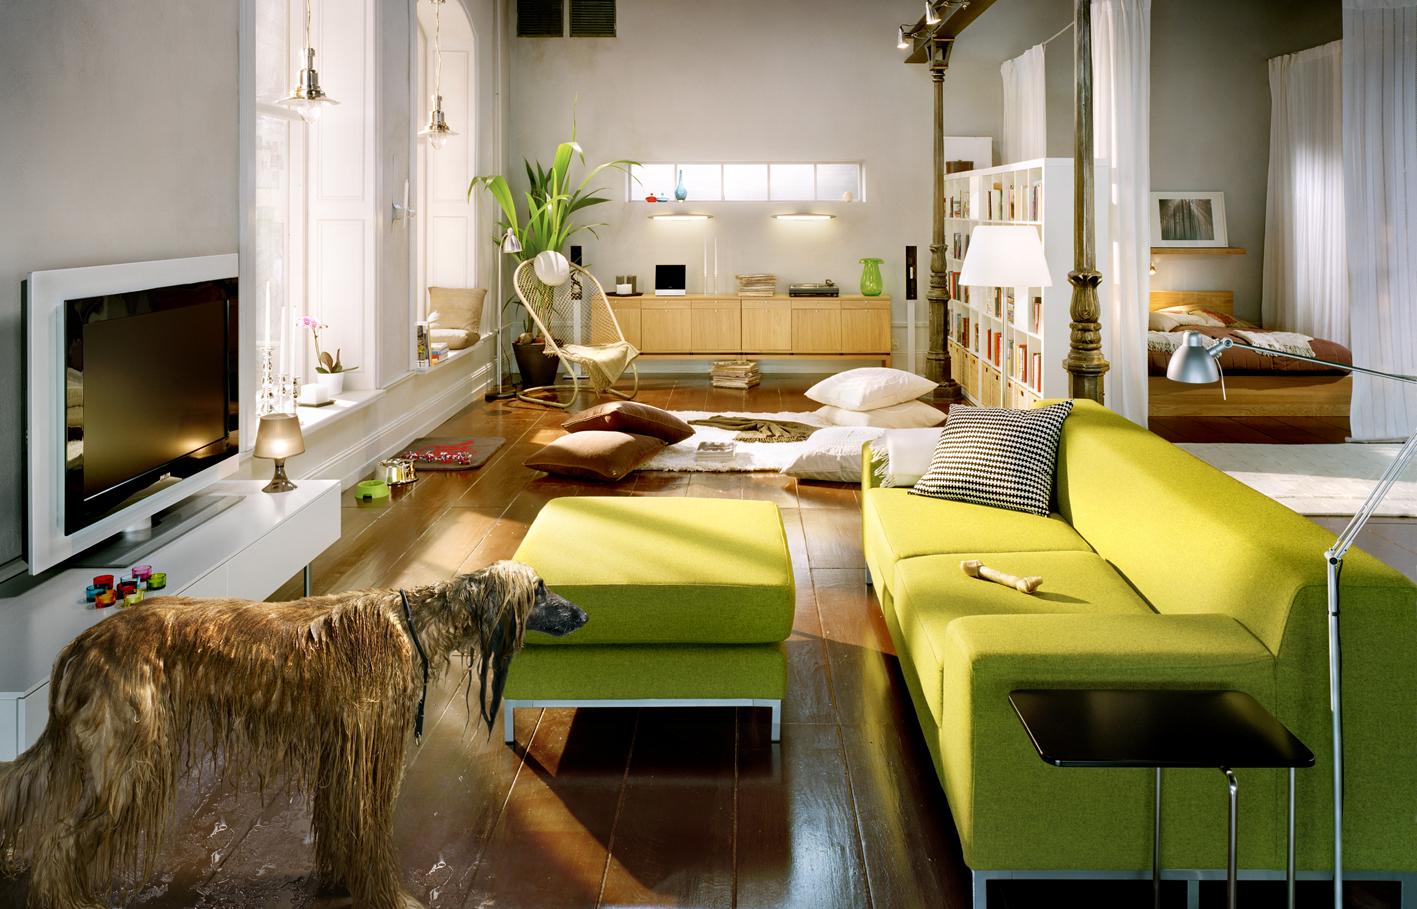 Sala De Estar Funcional ~  de espaços, utilizando também ao máximo o recurso natural de luz